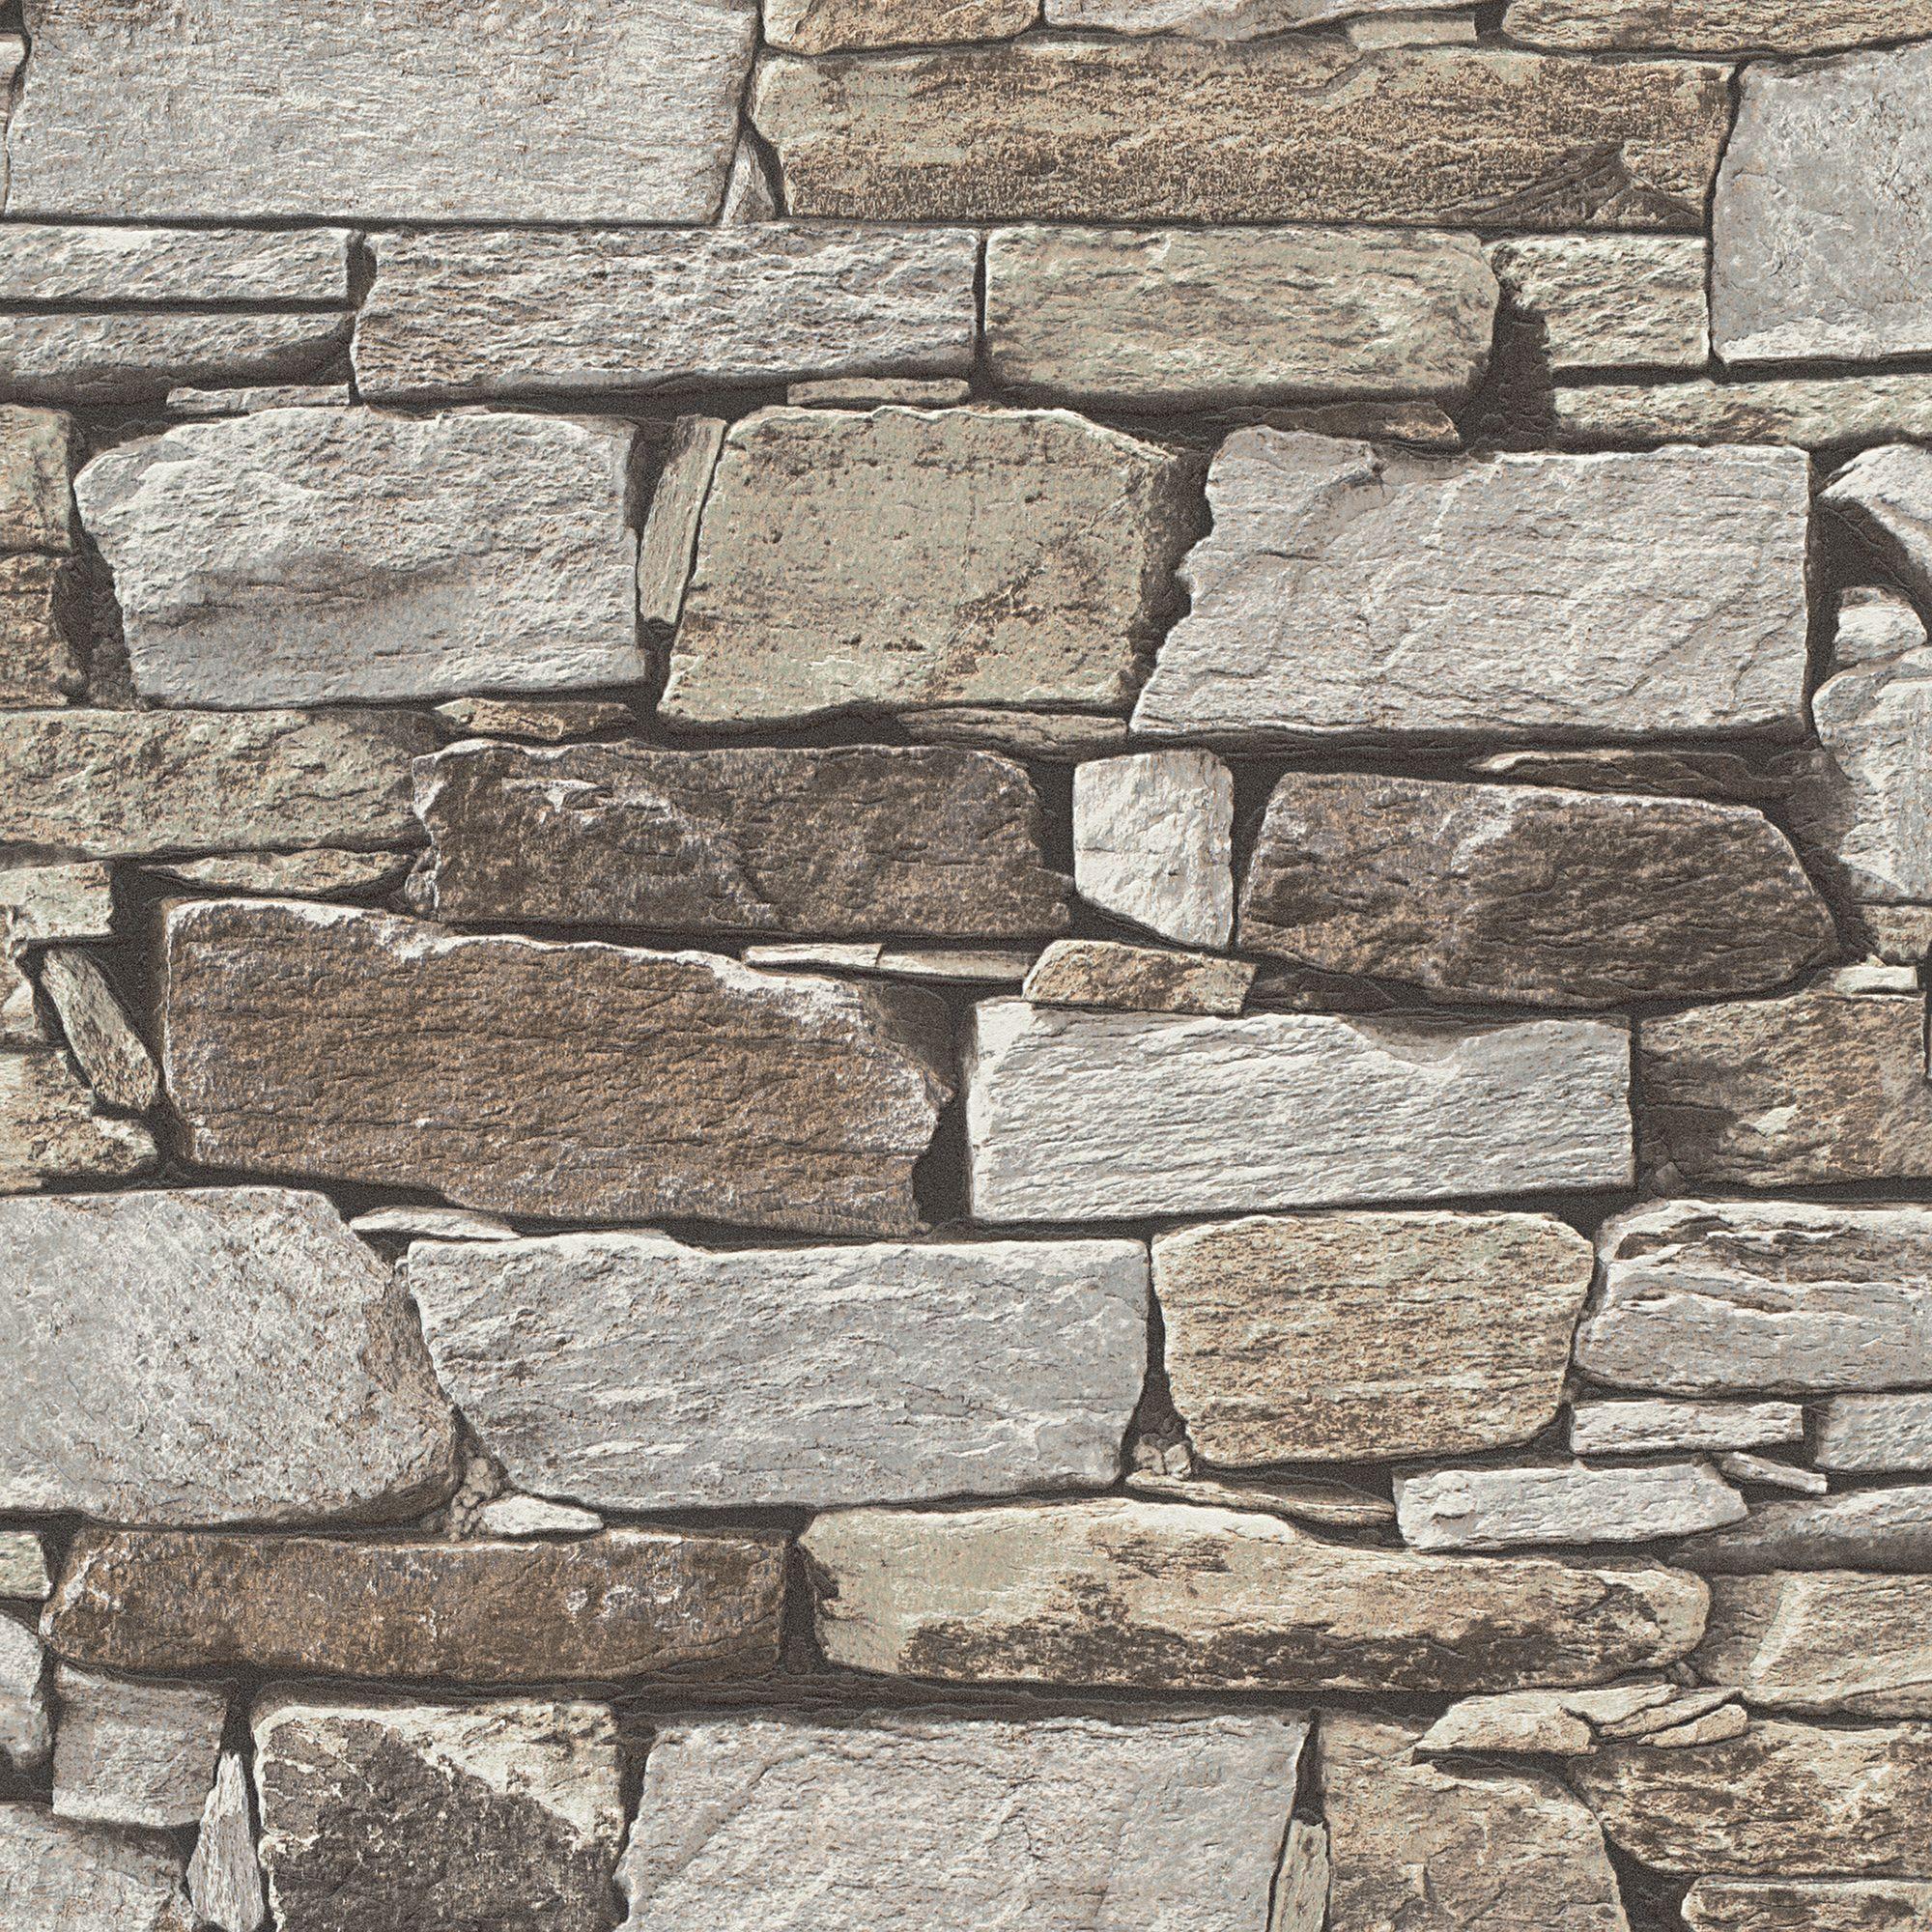 Brown Slate Stone Wallpaper Departments Diy At Bq HD Wallpapers Download Free Images Wallpaper [1000image.com]